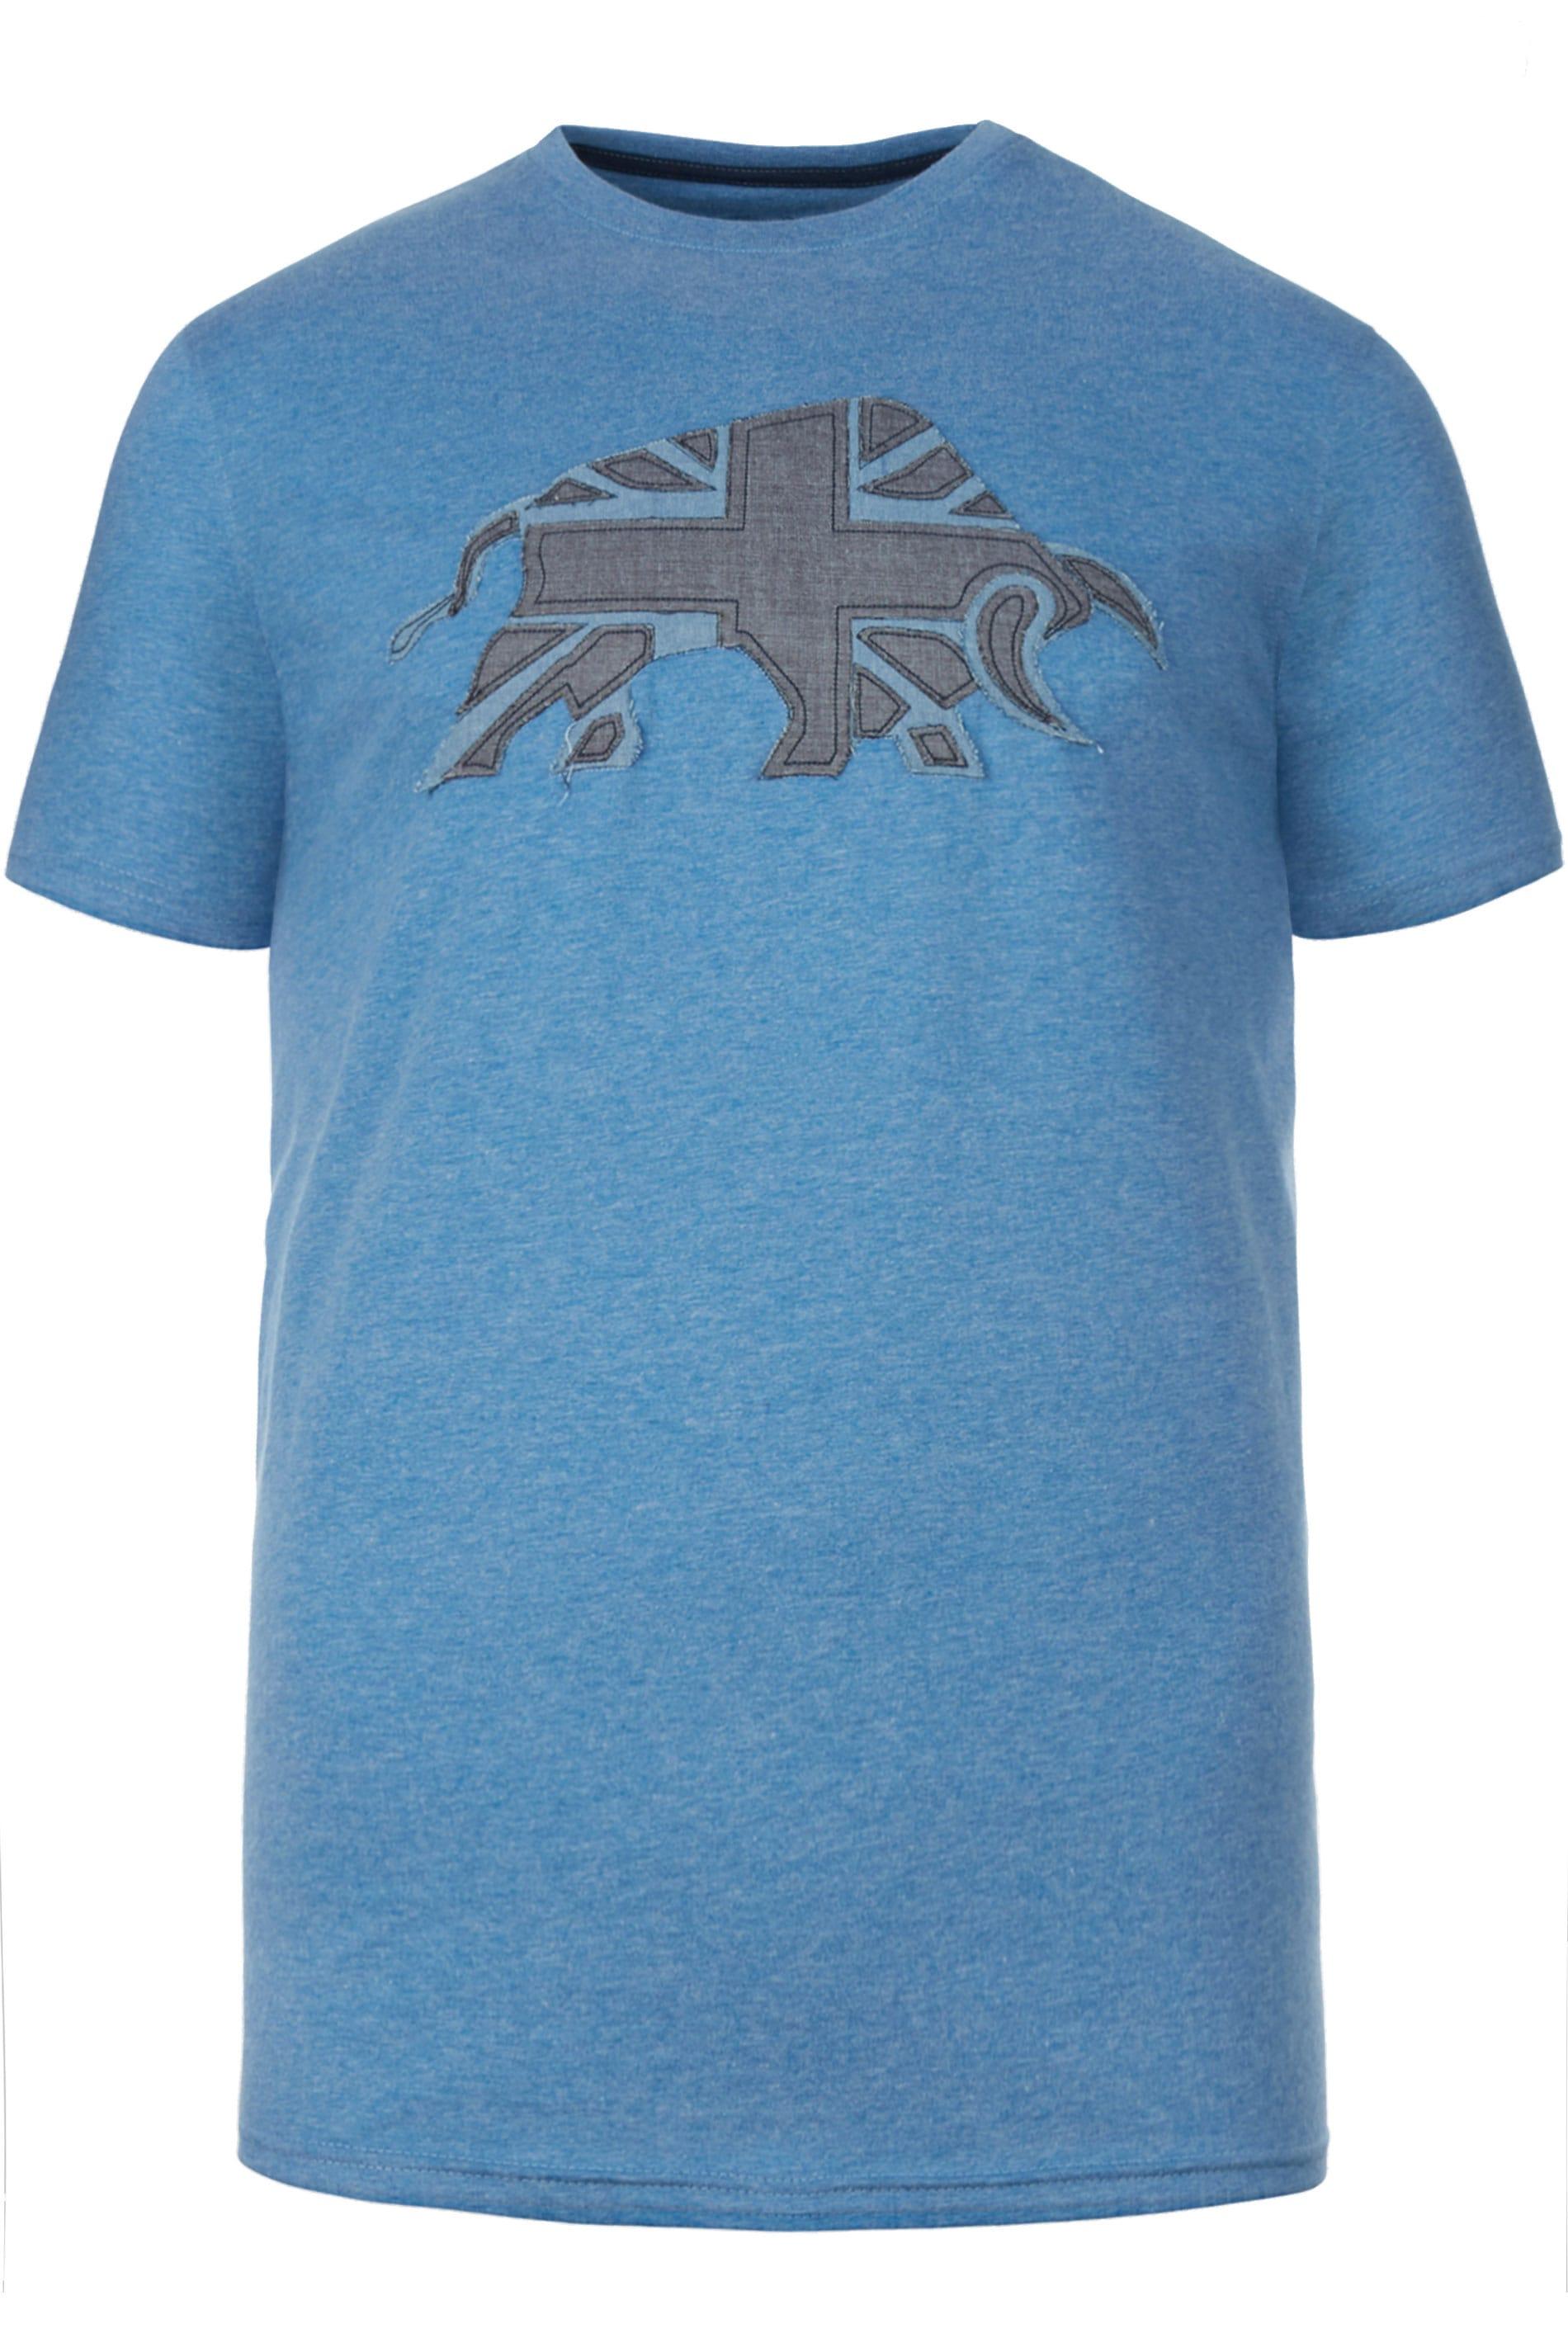 RAGING BULL Blue Union Jack T-Shirt